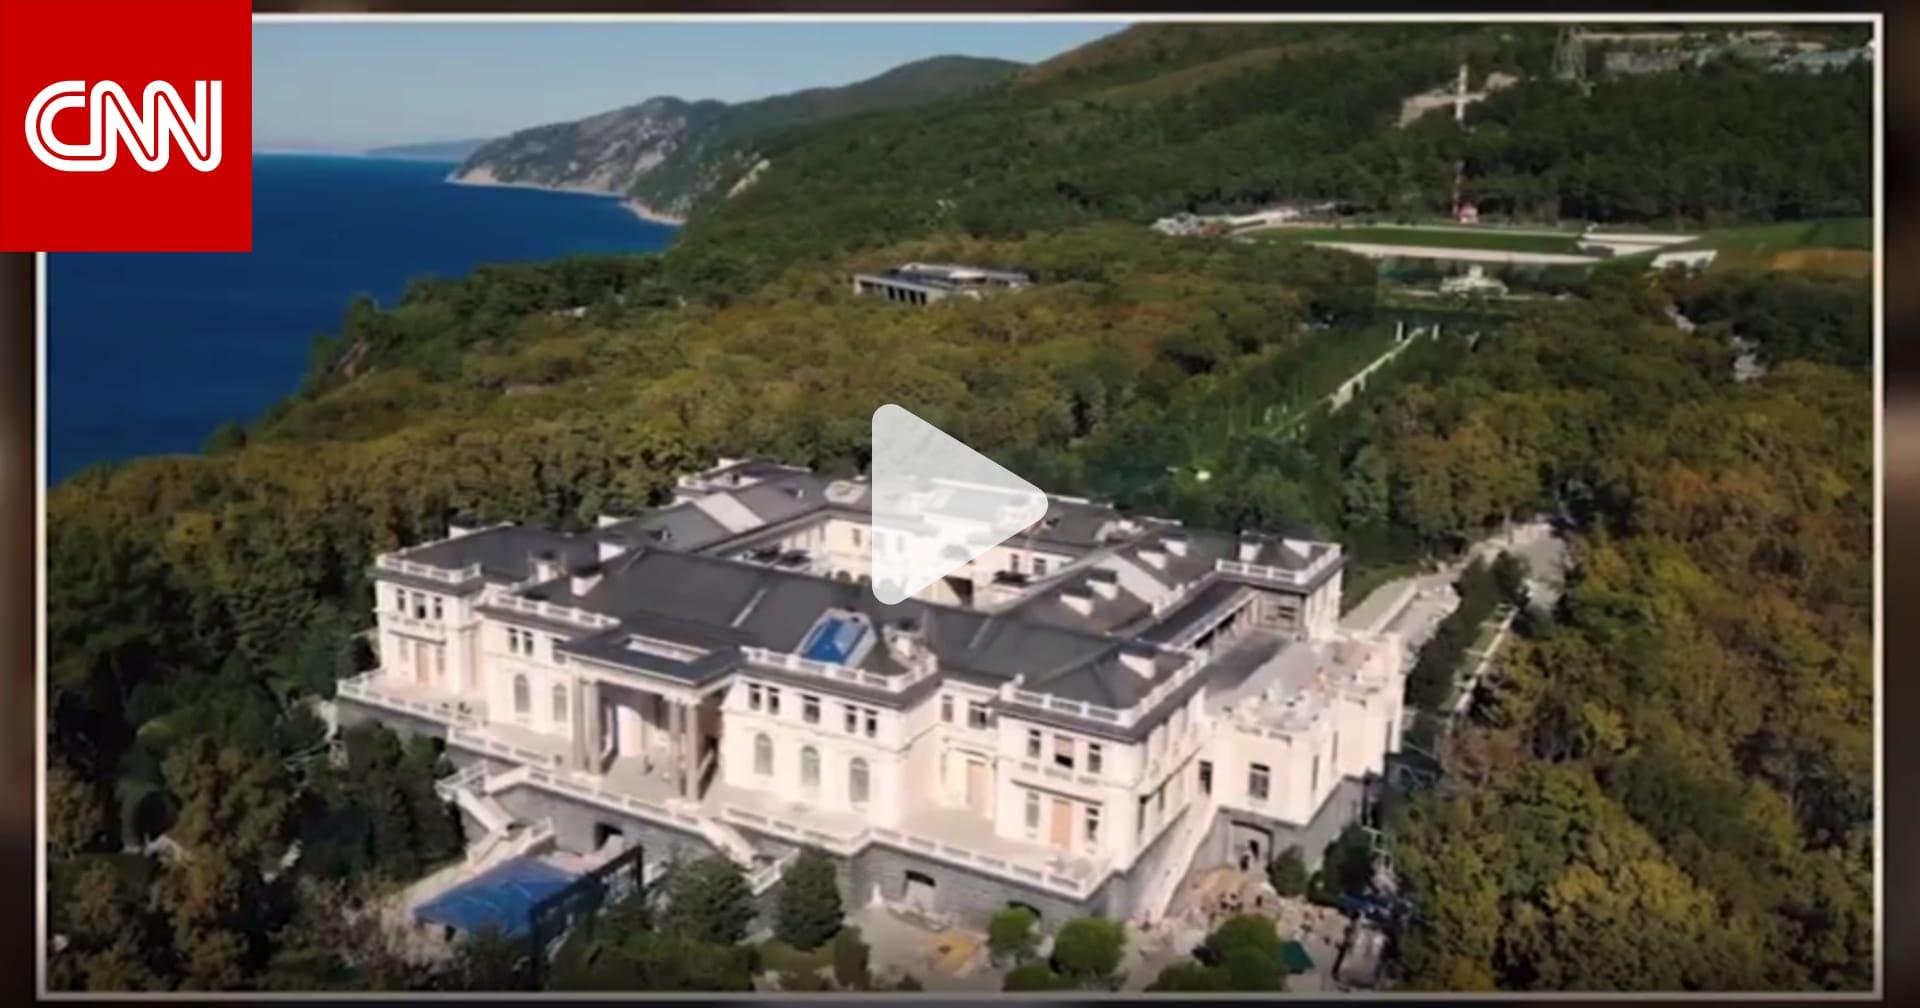 معارض روسي يصور سراً قصرا ضخماً يقول إنه لبوتين.. ما قصته؟